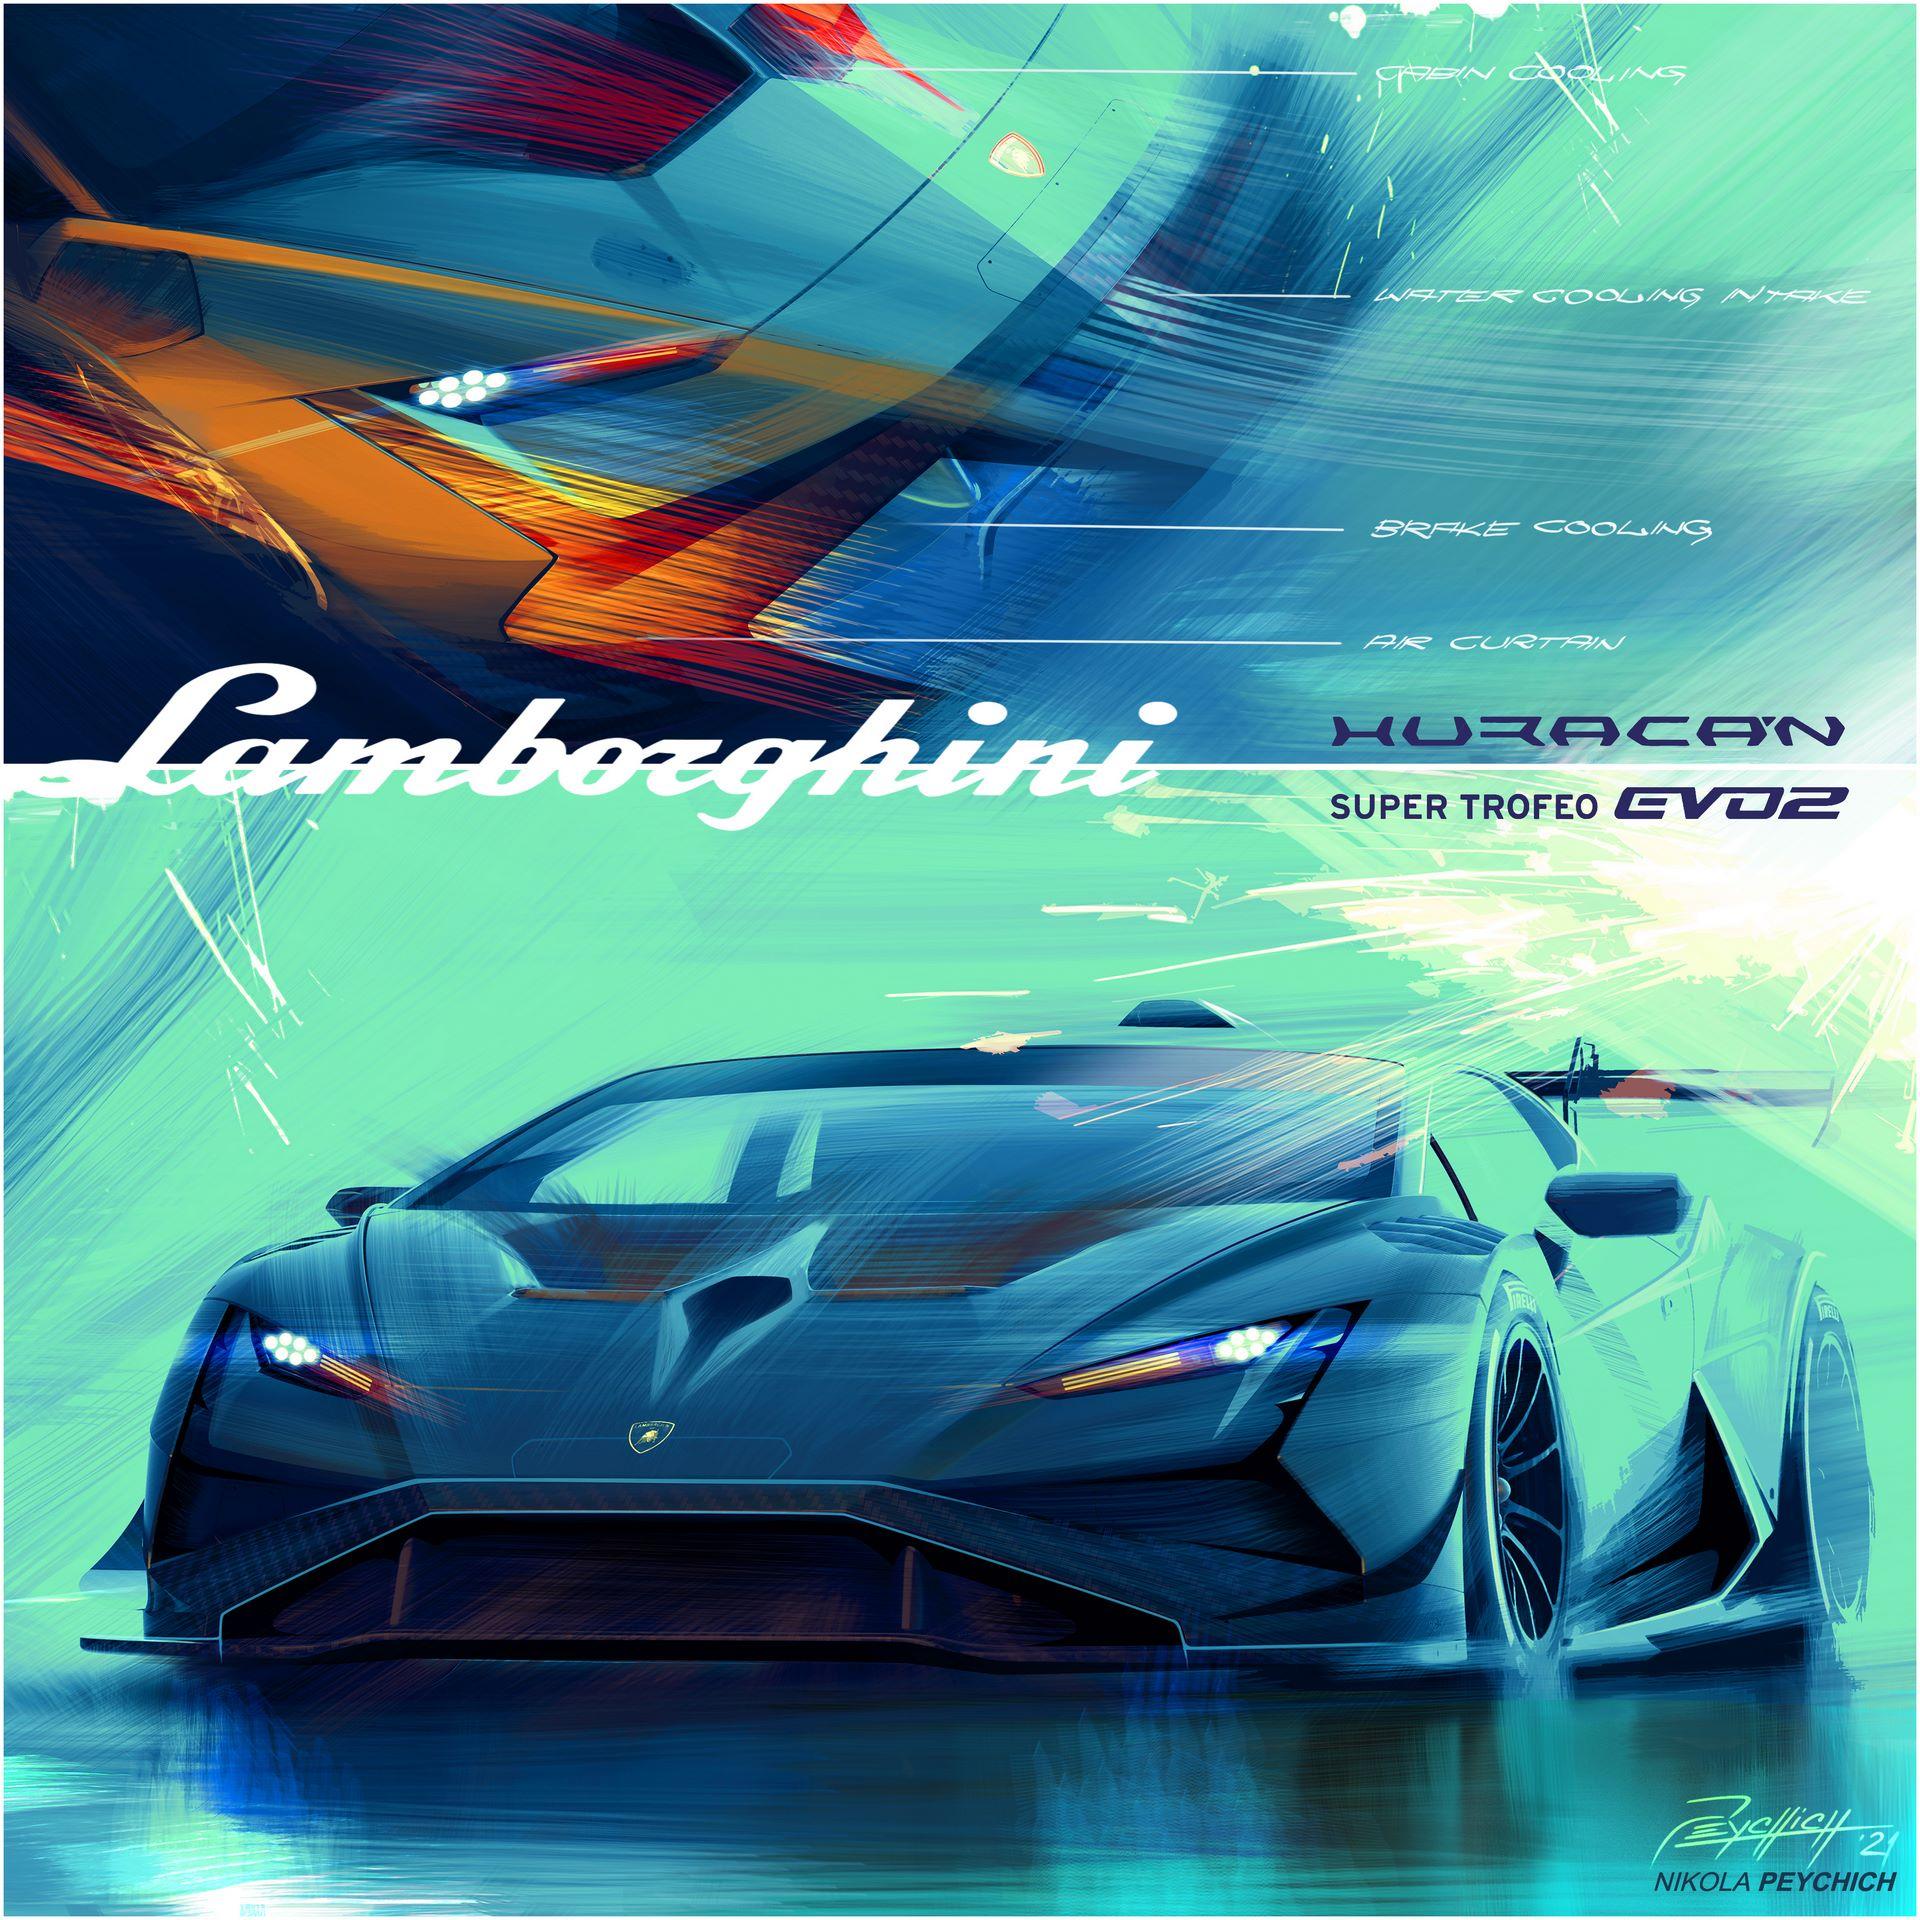 Lamborghini-Huracan-Super-Trofeo-EVO2-23